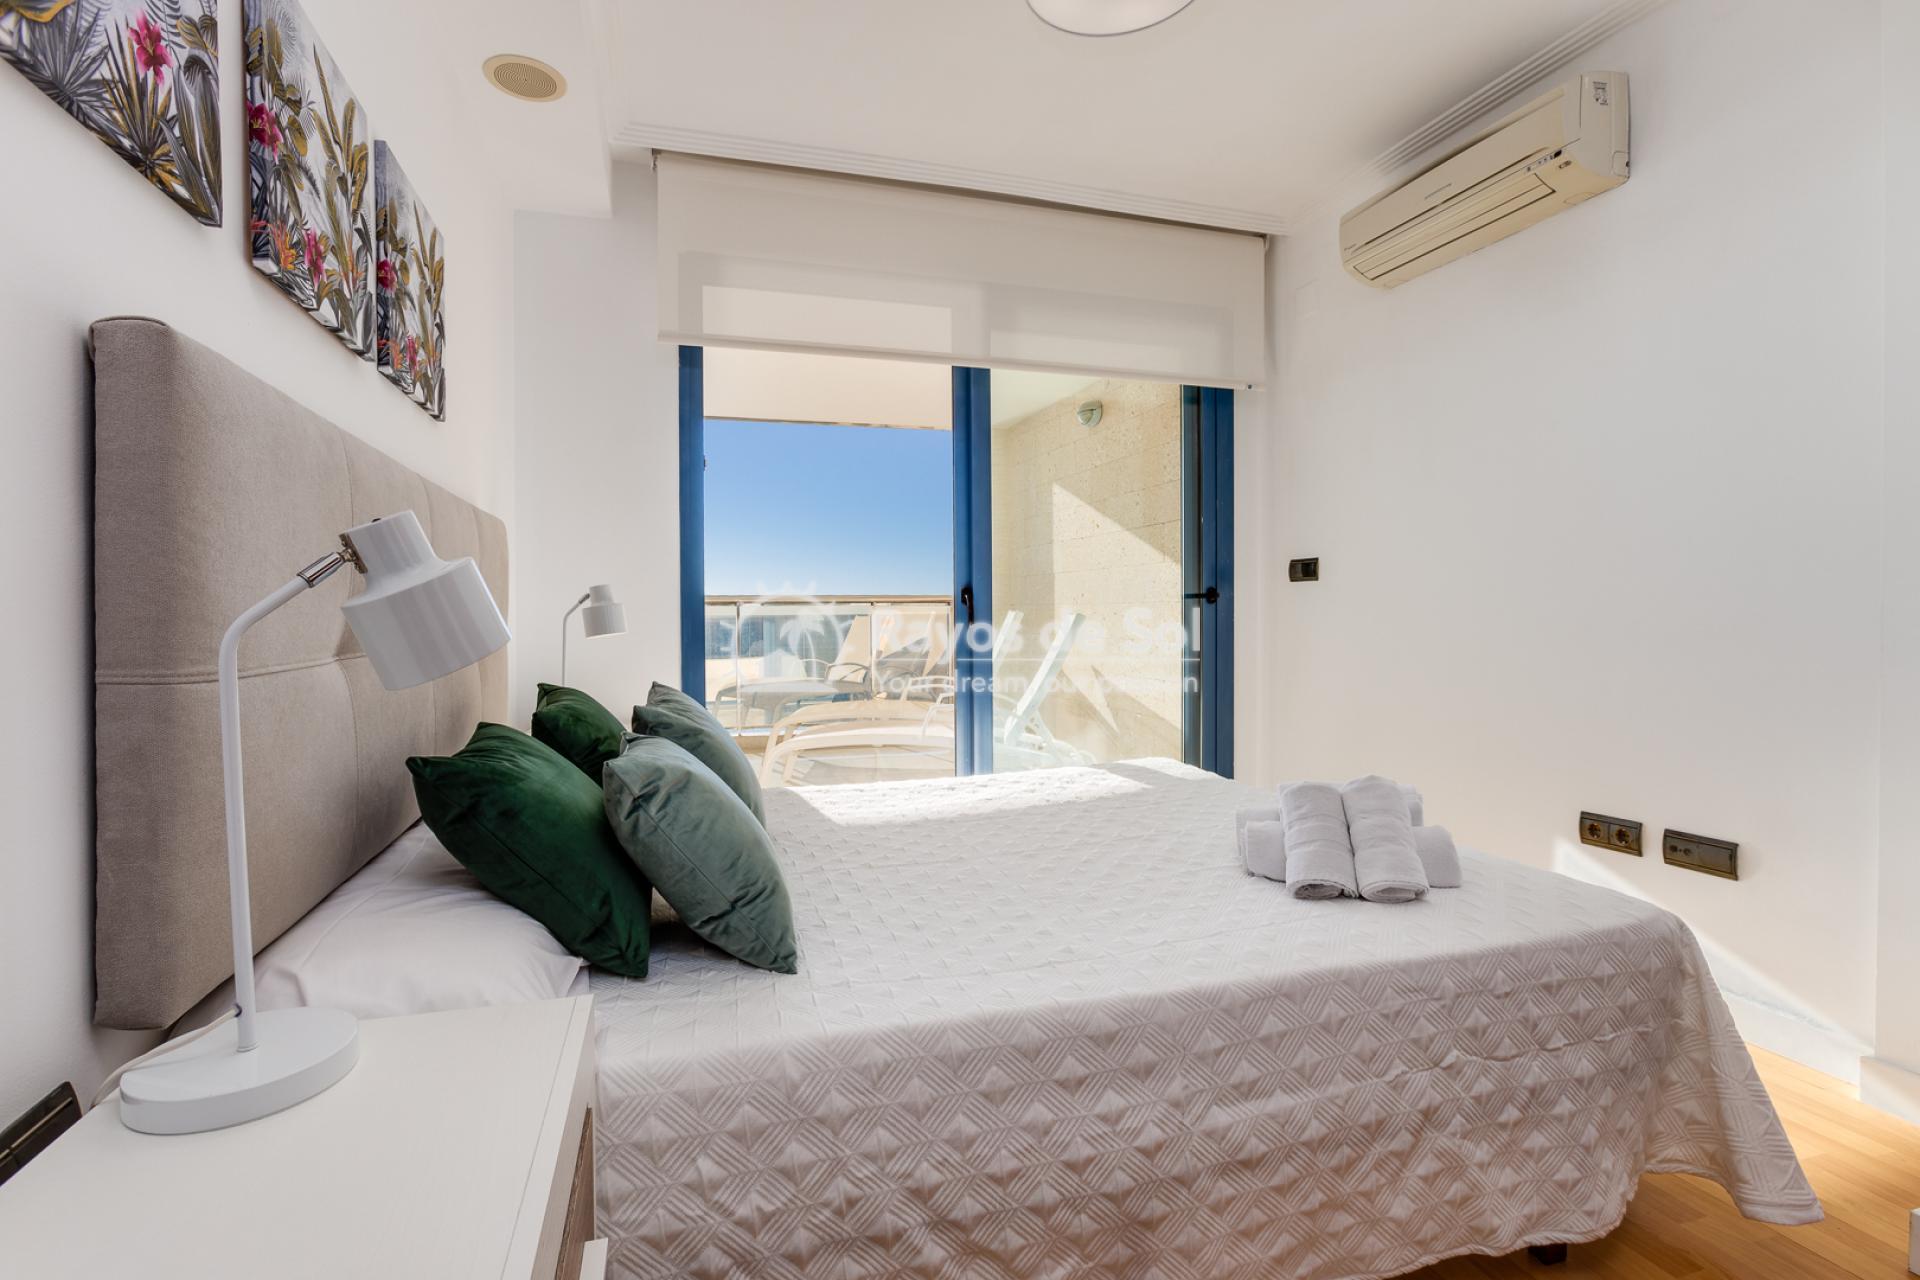 Turnekey first line apartments  in Altea, Costa Blanca (Alteabeach) - 29